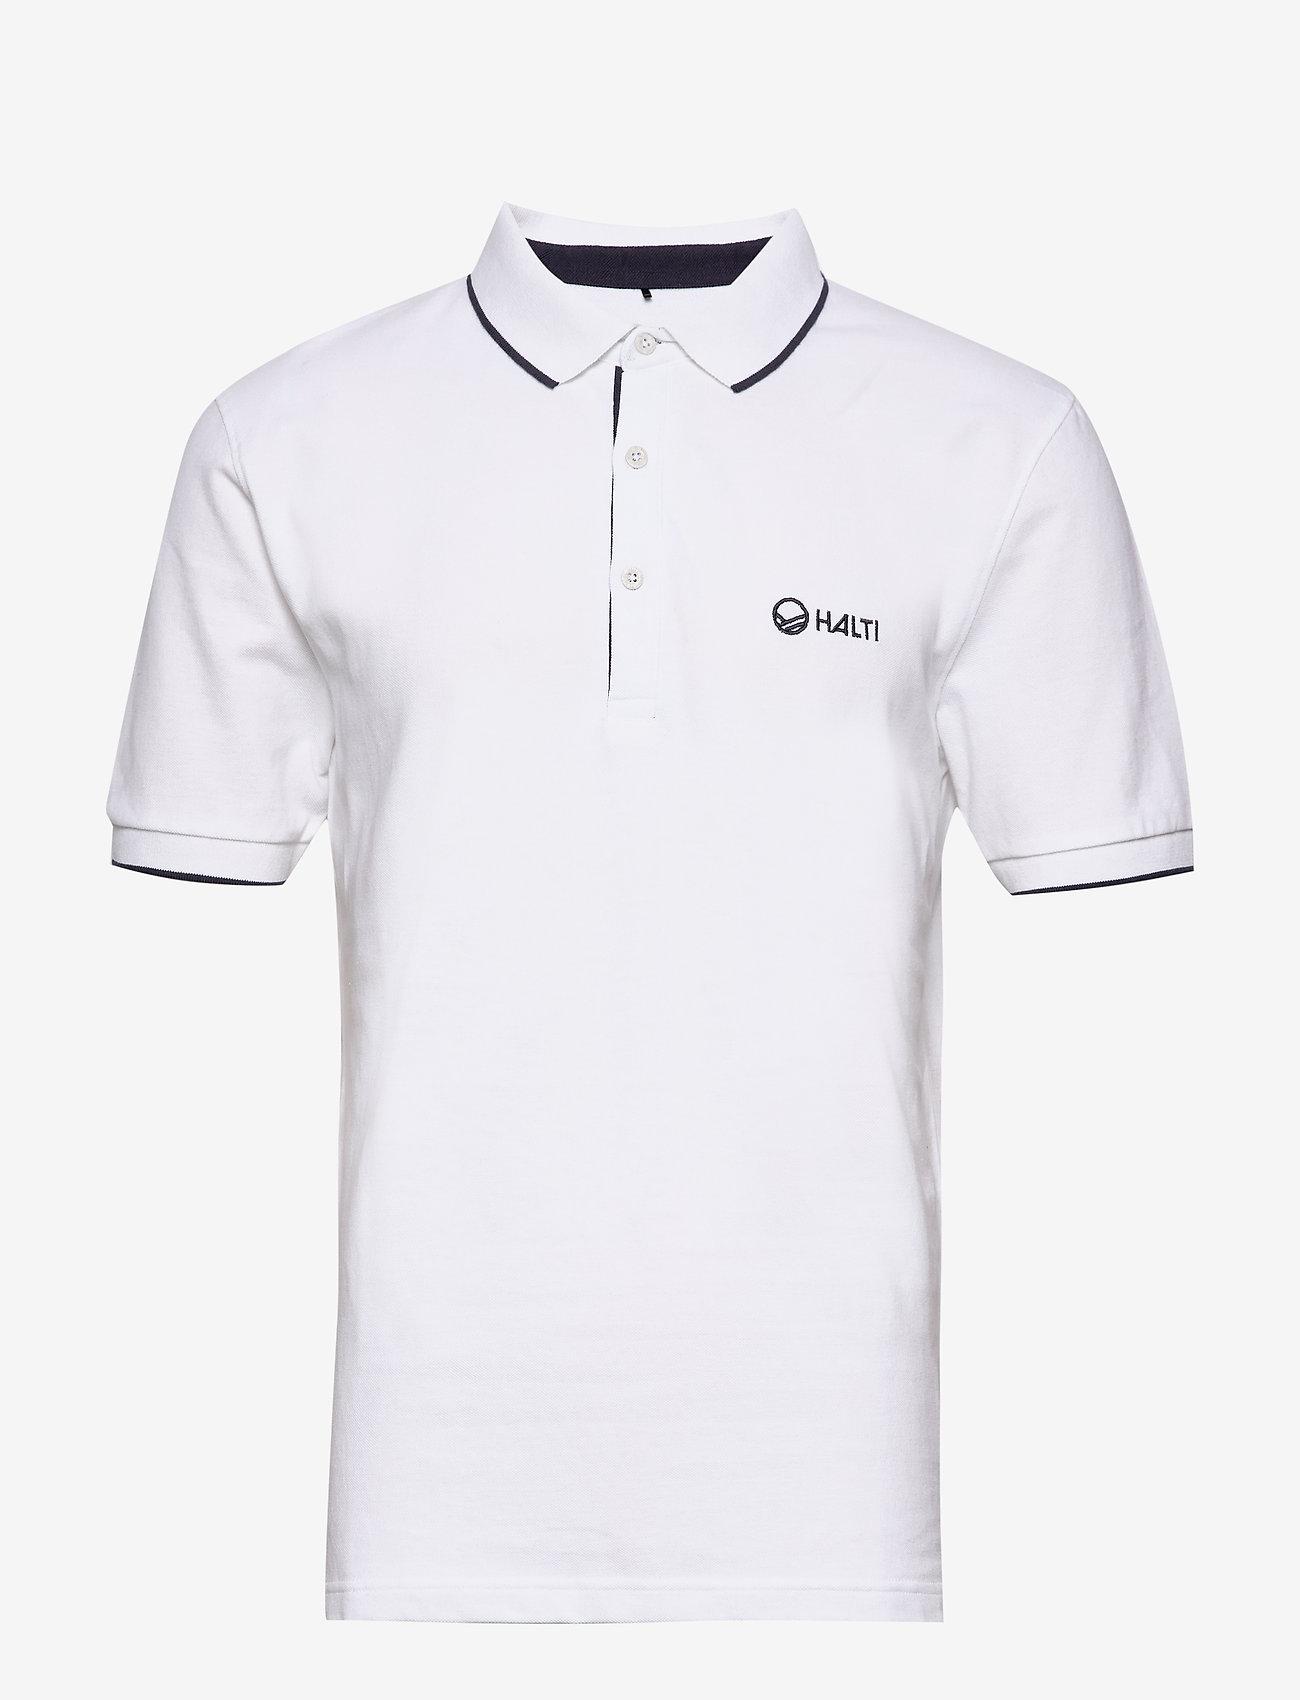 Halti - Lari Men's Polo shirt - kurzärmelig - white - 0